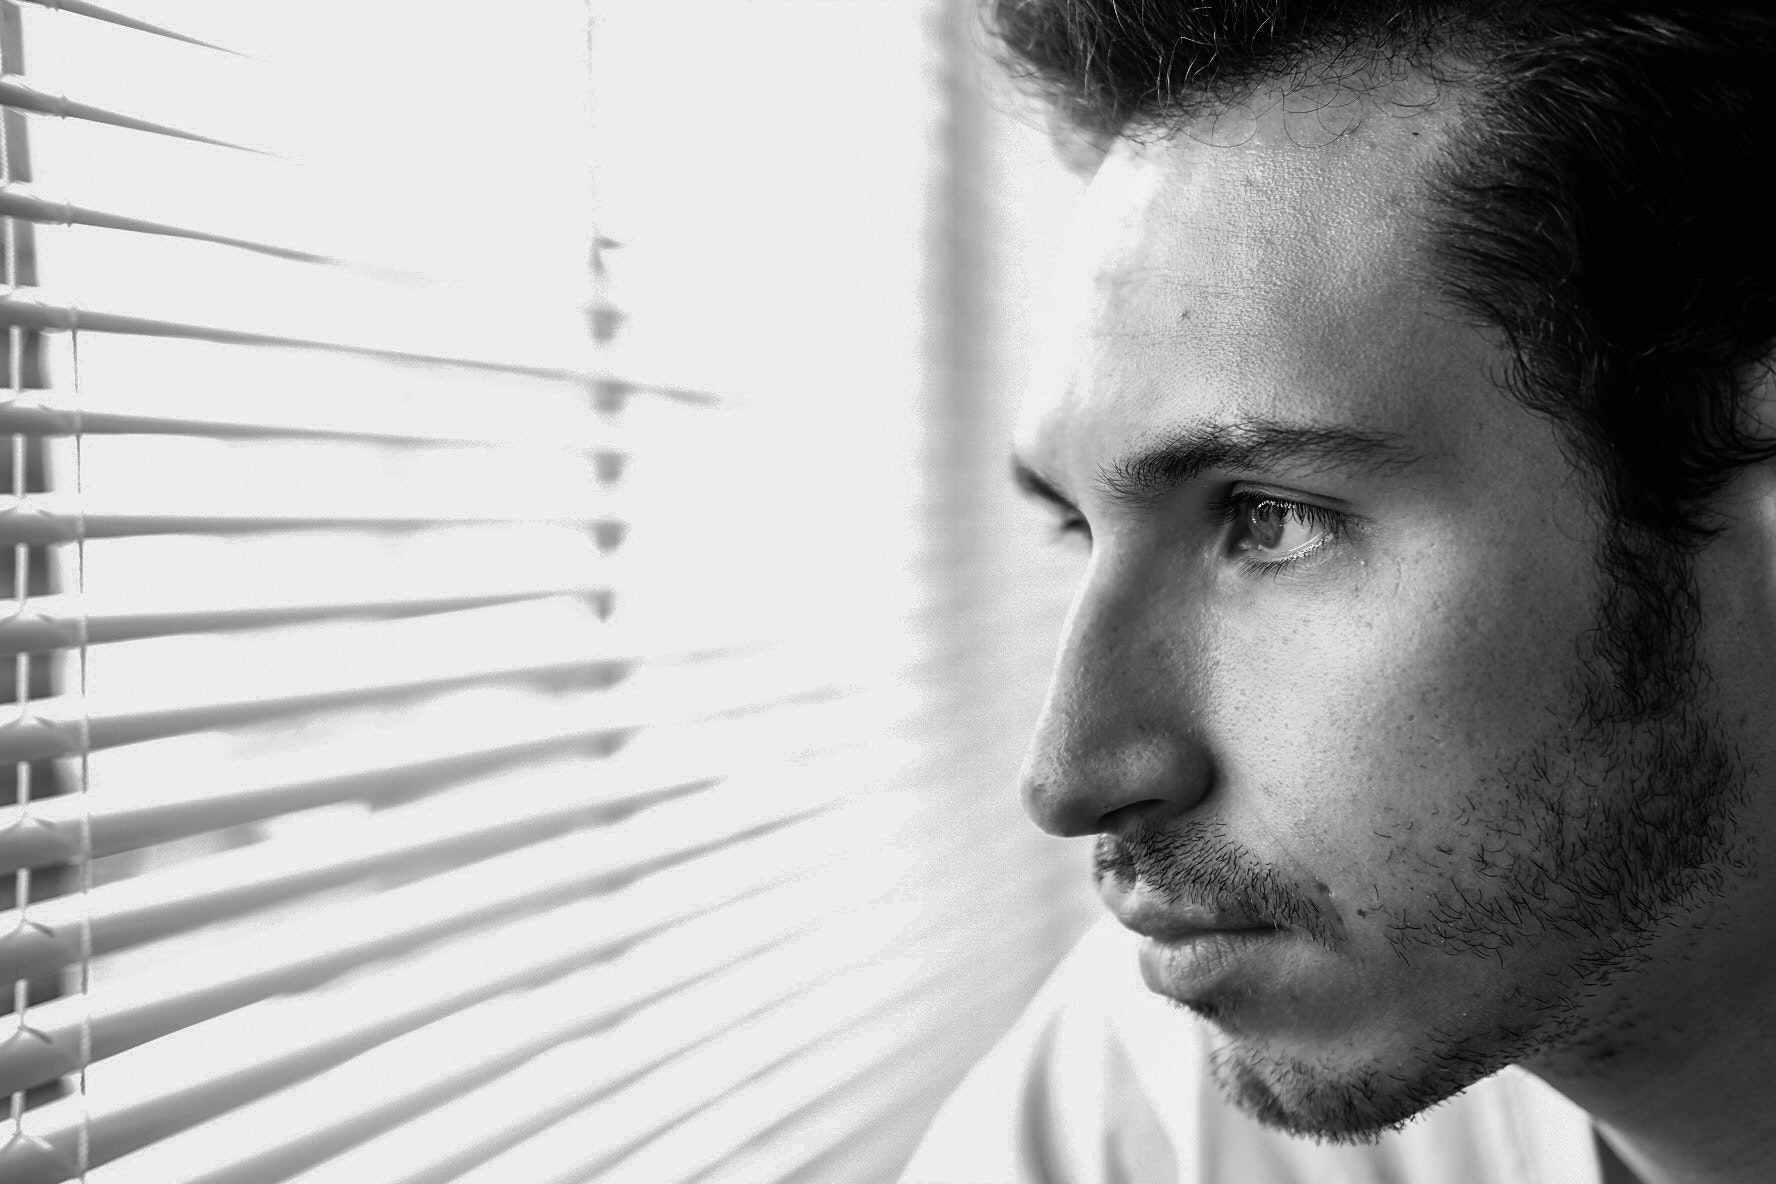 Man Looking Through Window, Actor, Window, Studio, Side view, HQ Photo